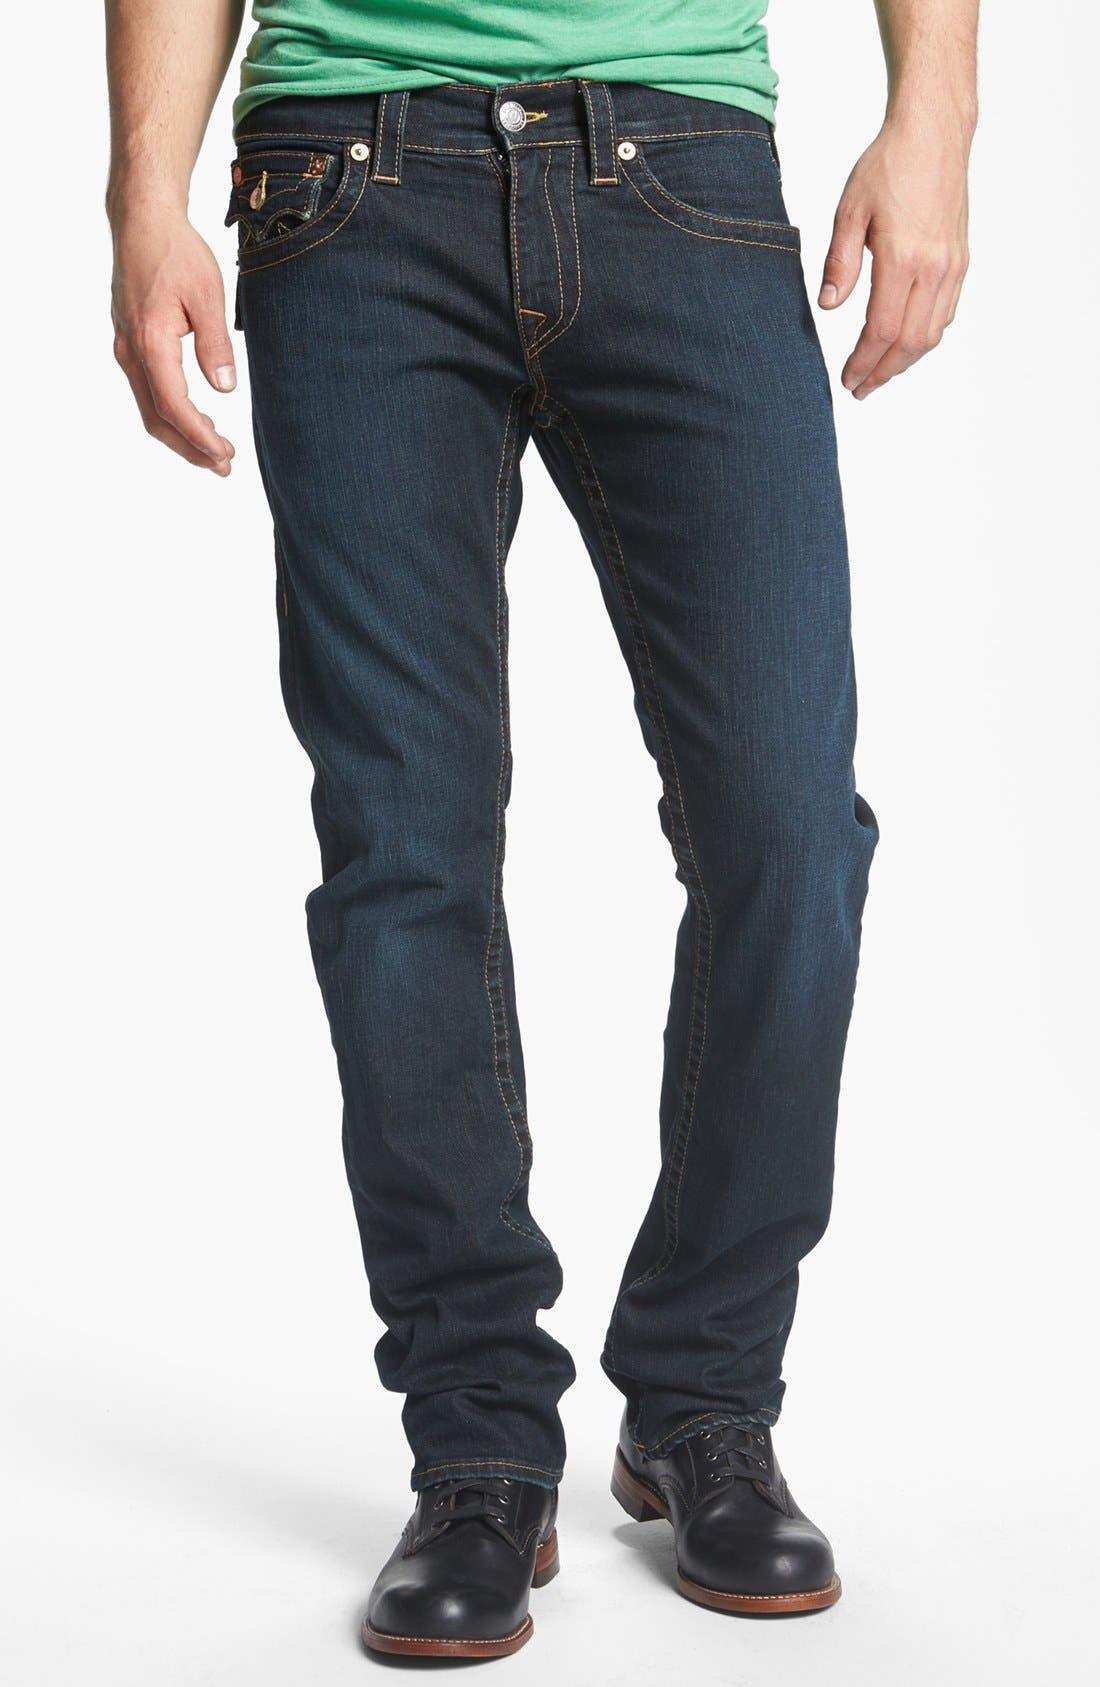 Alternate Image 2  - True Religion Brand Jeans 'Ricky' Straight Leg Jeans (Jackknife)